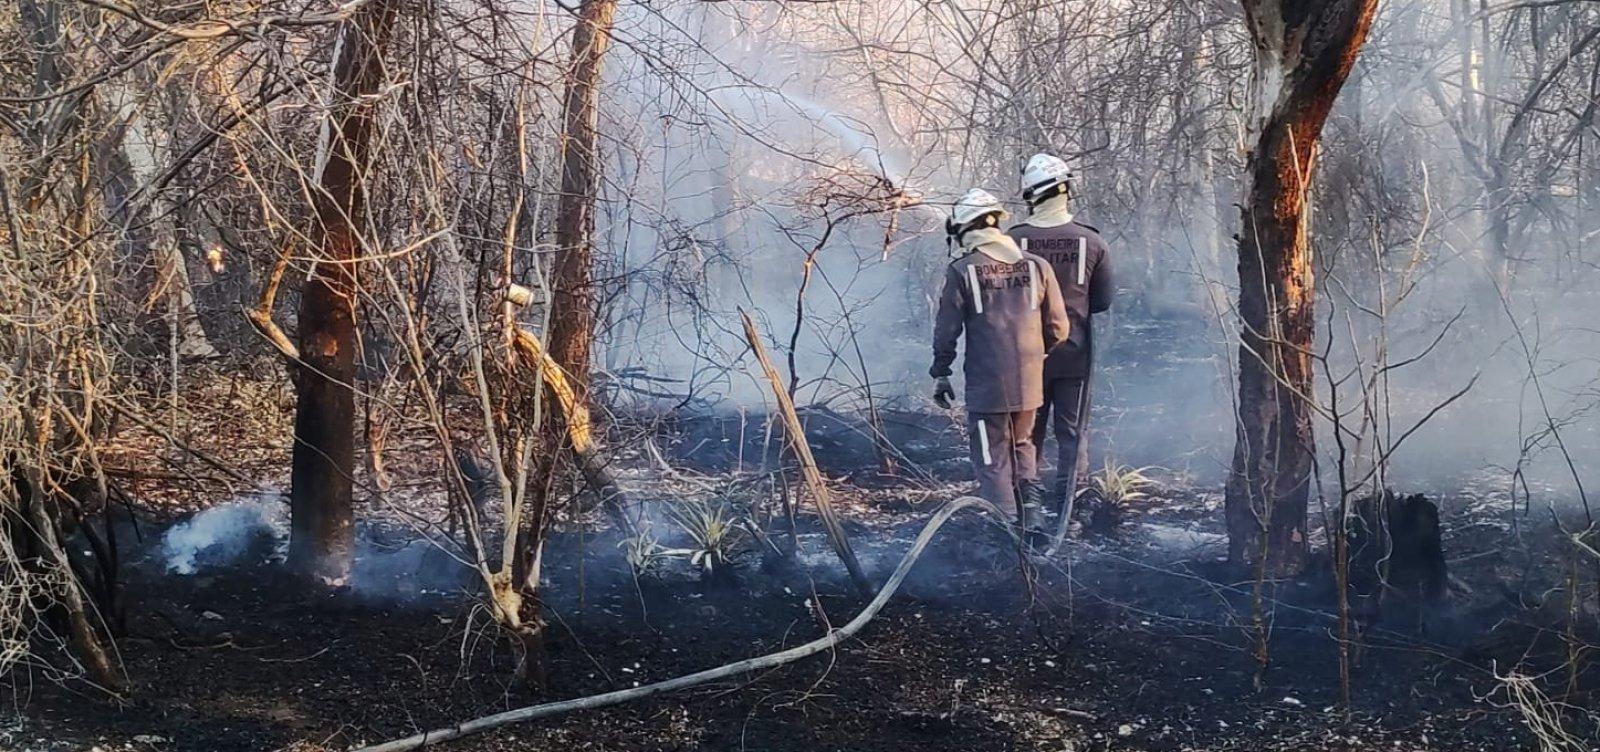 Incêndio atinge área na zona rural em Guanambi